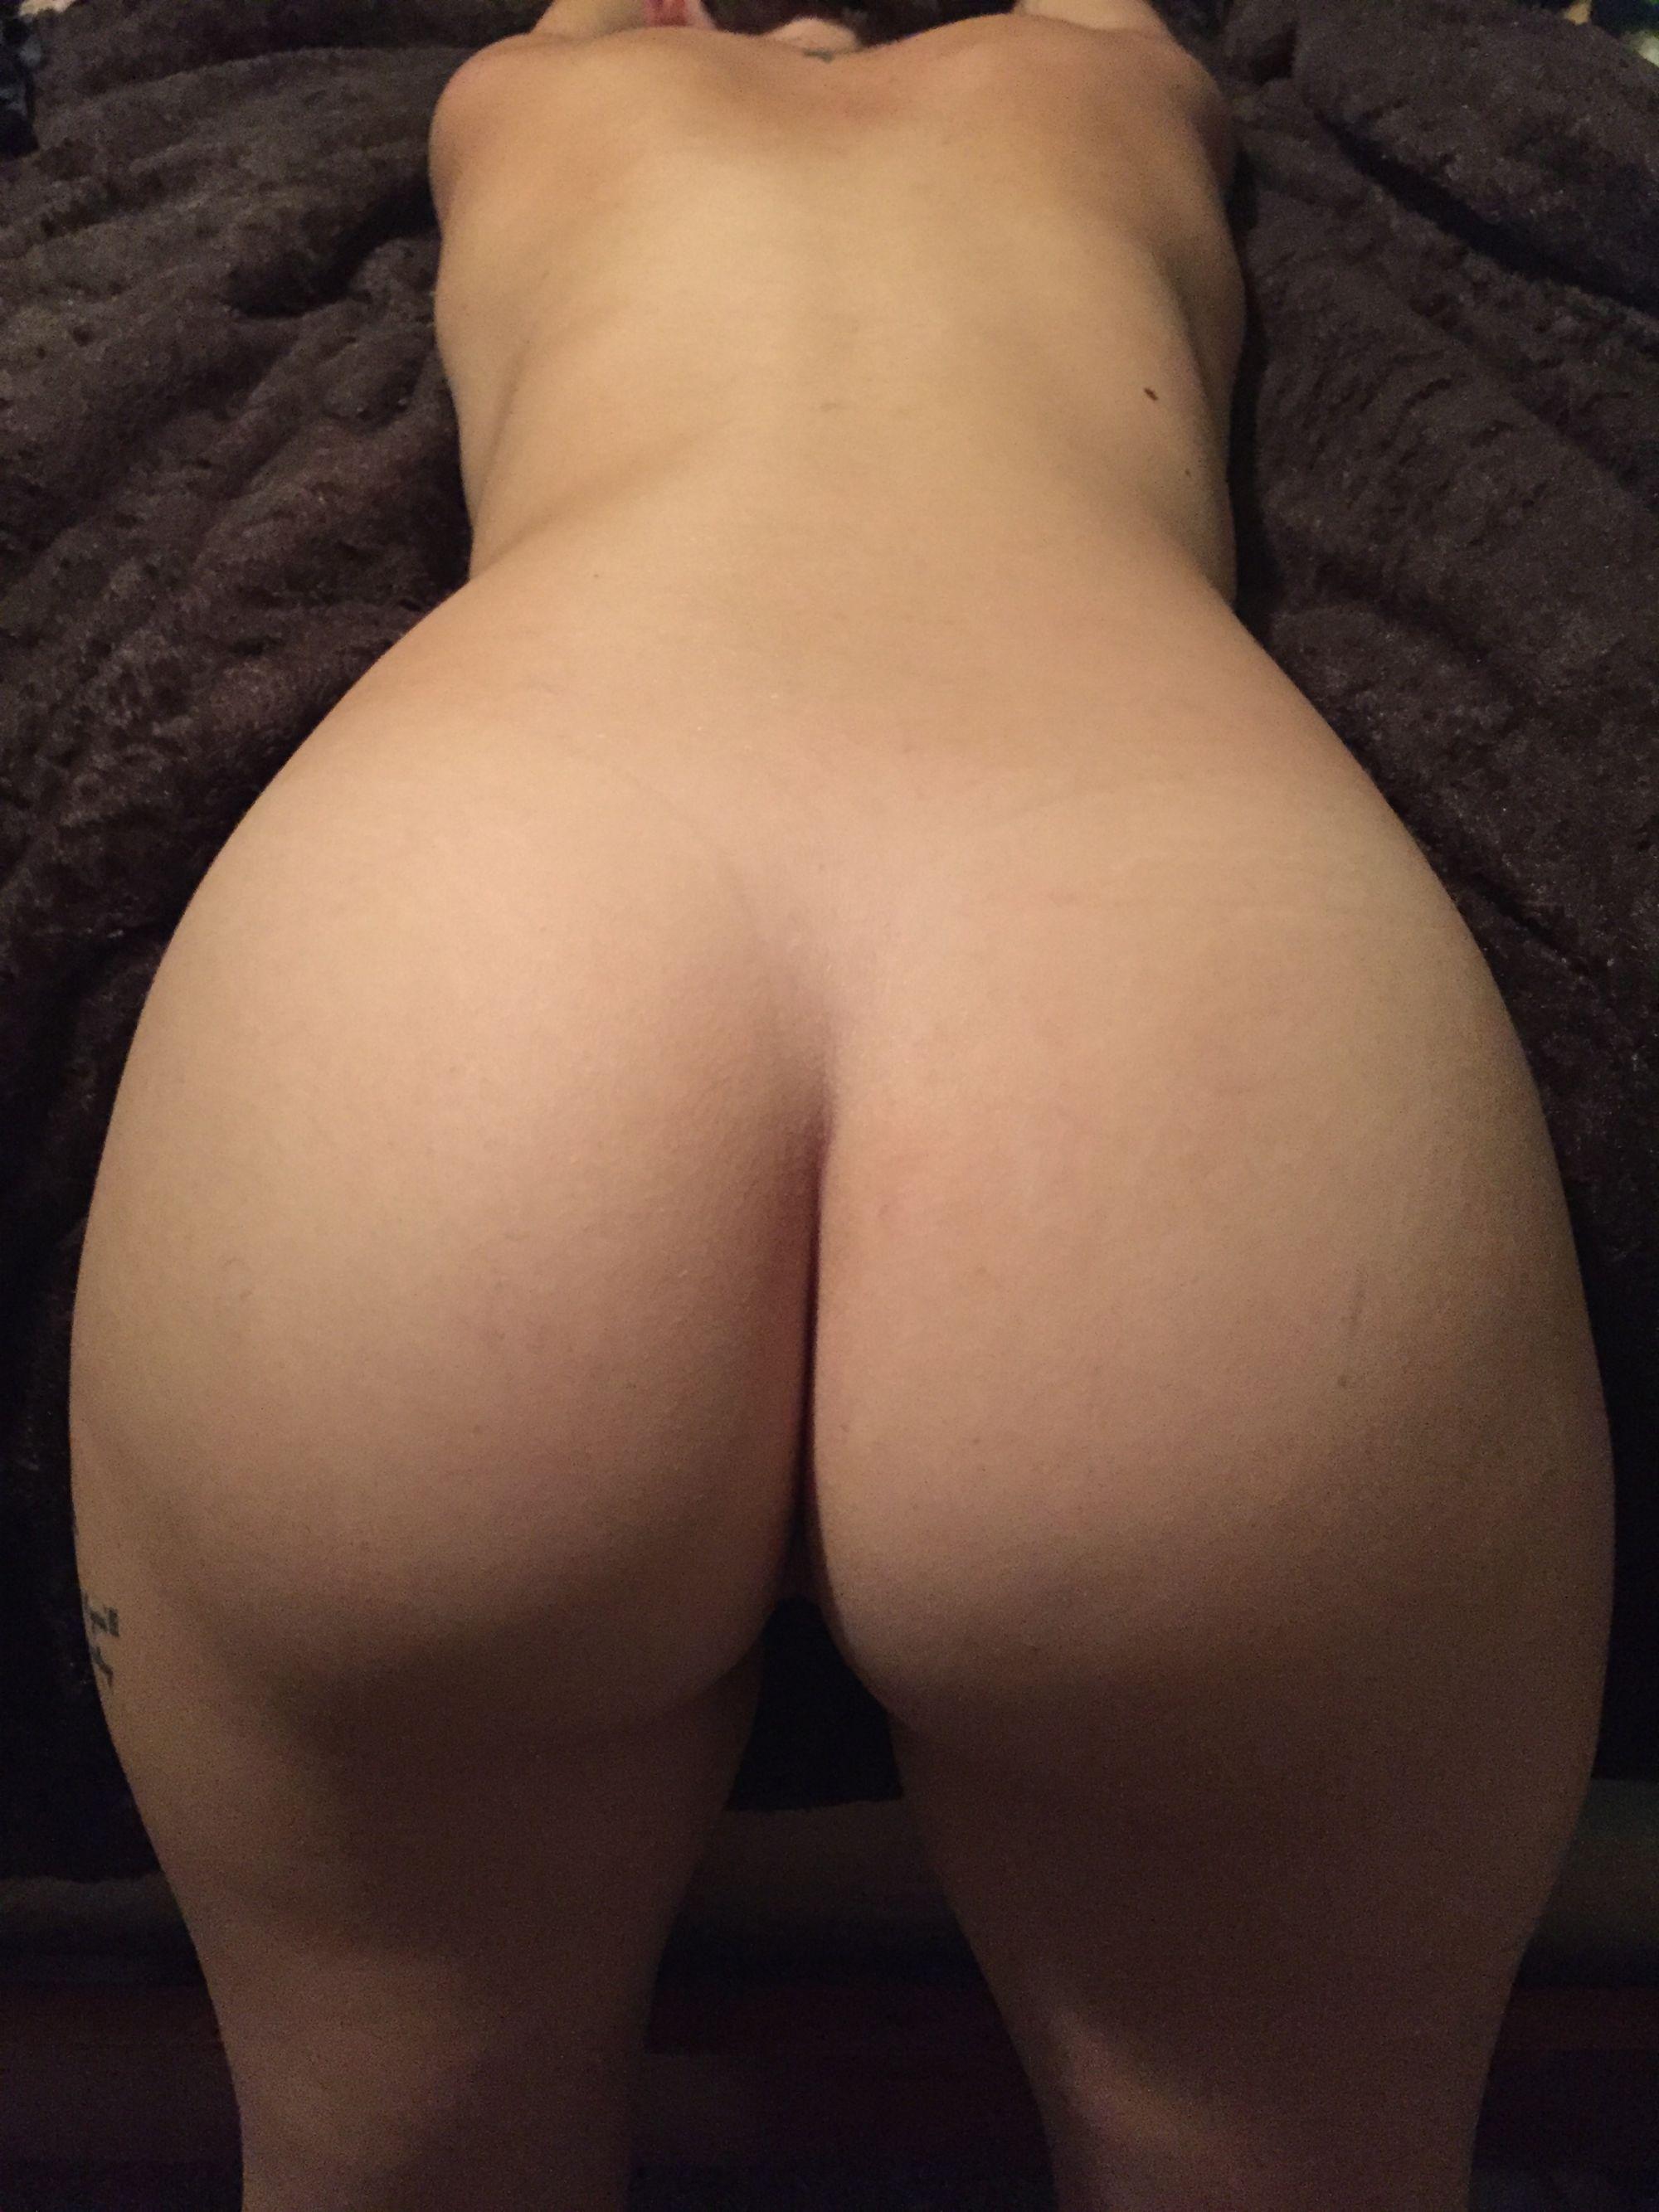 Big ass bend over